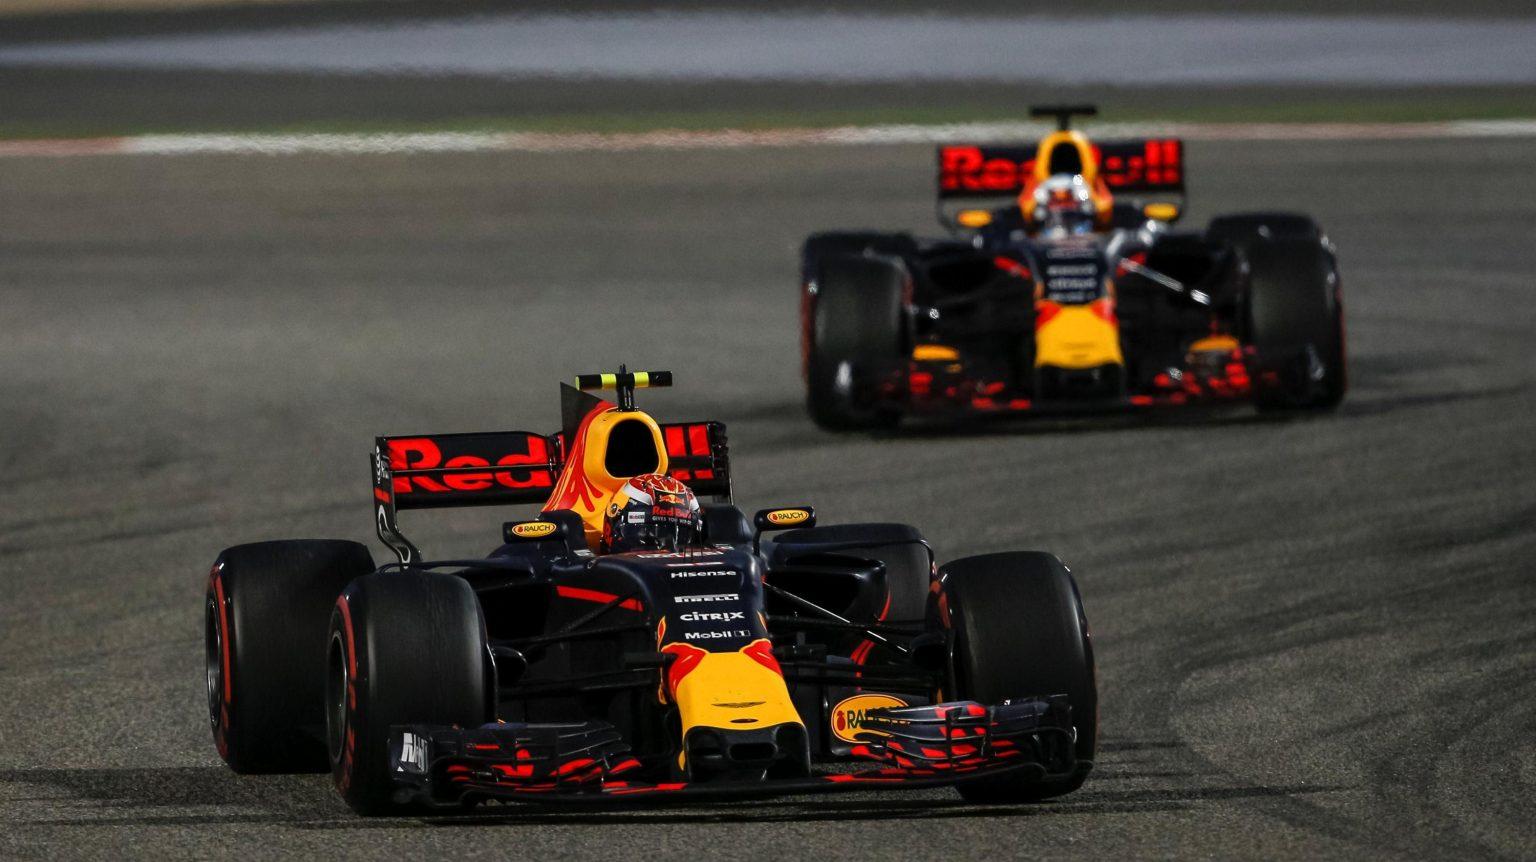 gp_bahrein_red bull